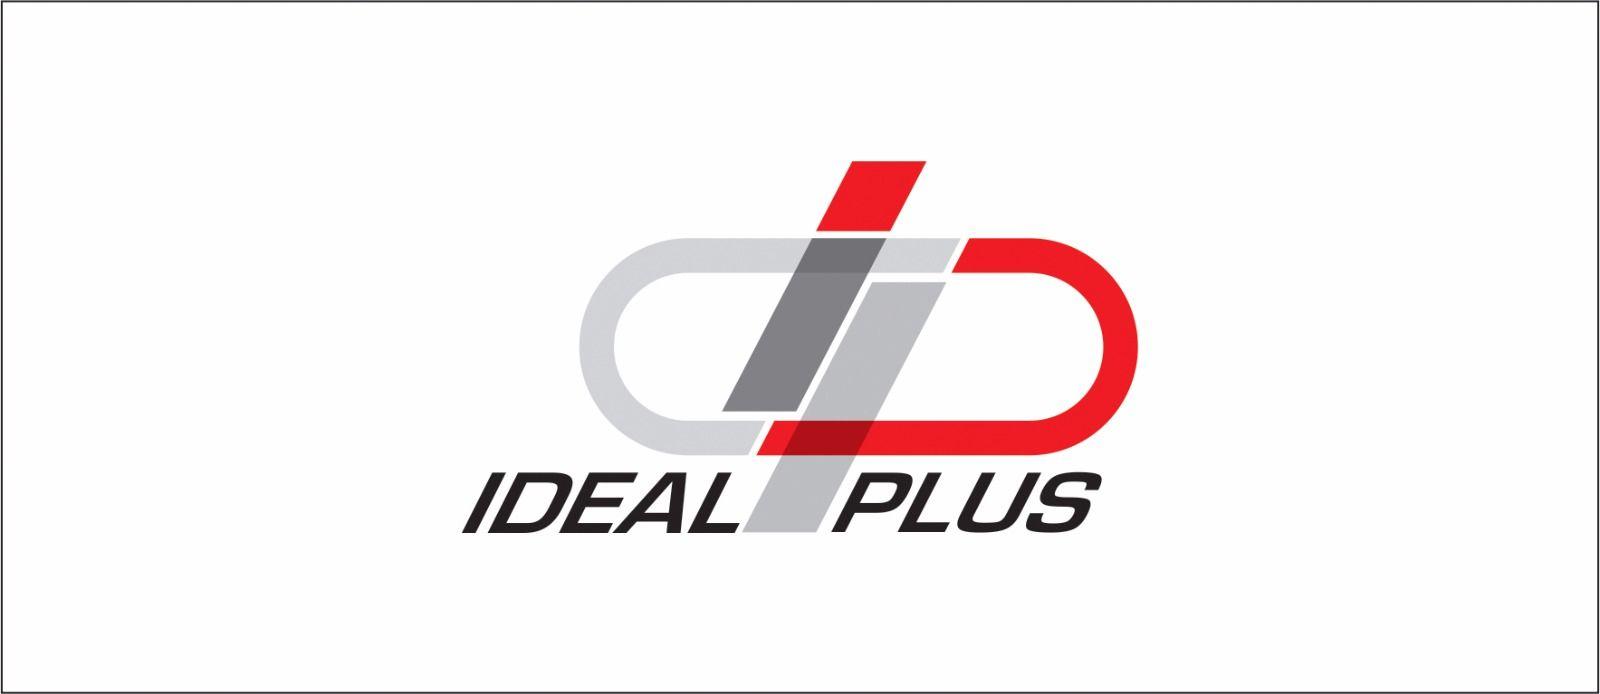 Do branded logo design   Logo design services, Design services and ...